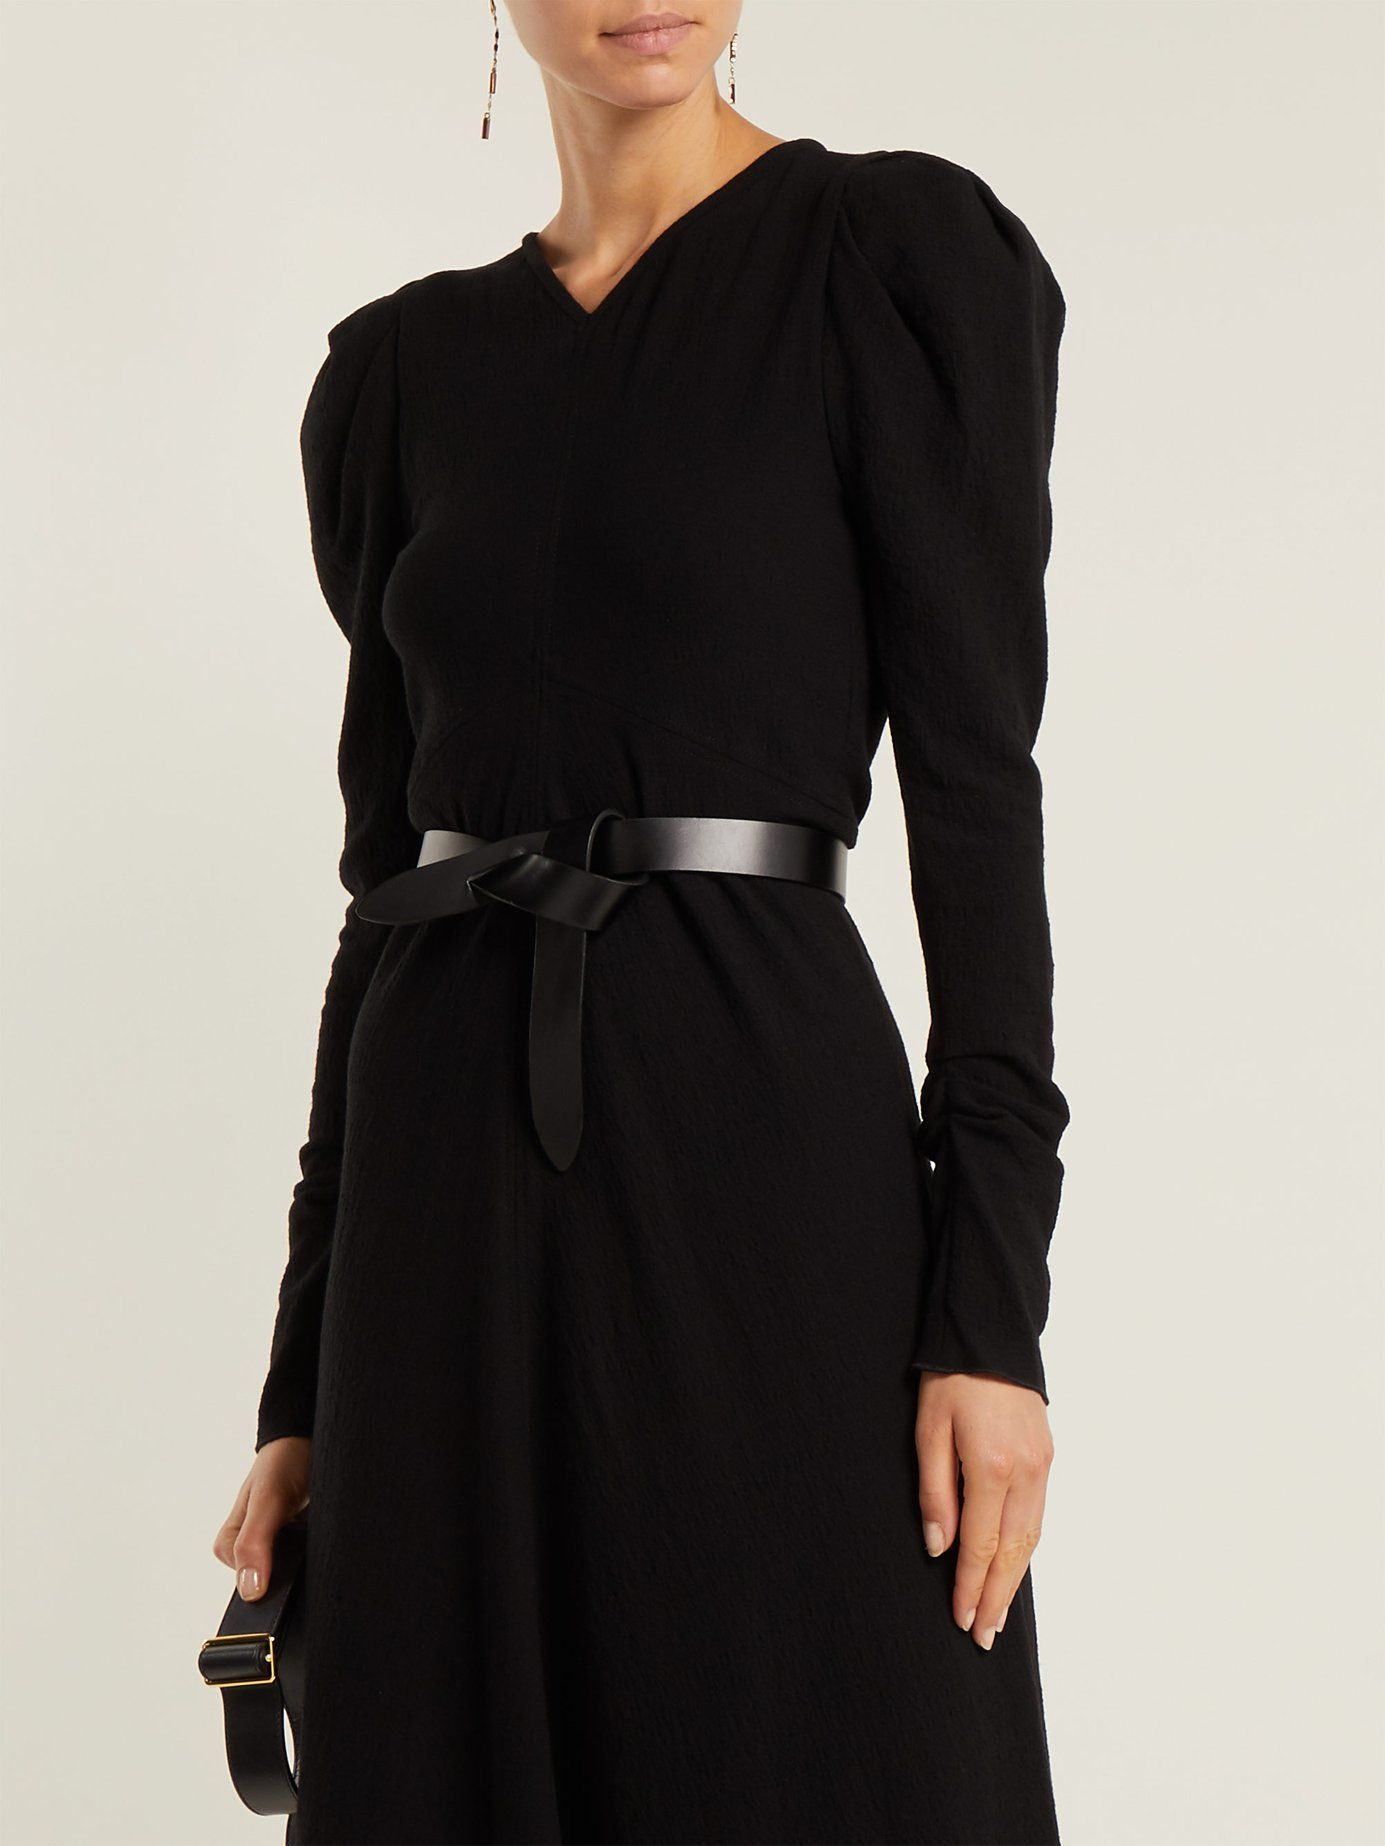 ef02bd4ba71 Lecce skinny knot leather belt | Isabel Marant | MATCHESFASHION.COM ...